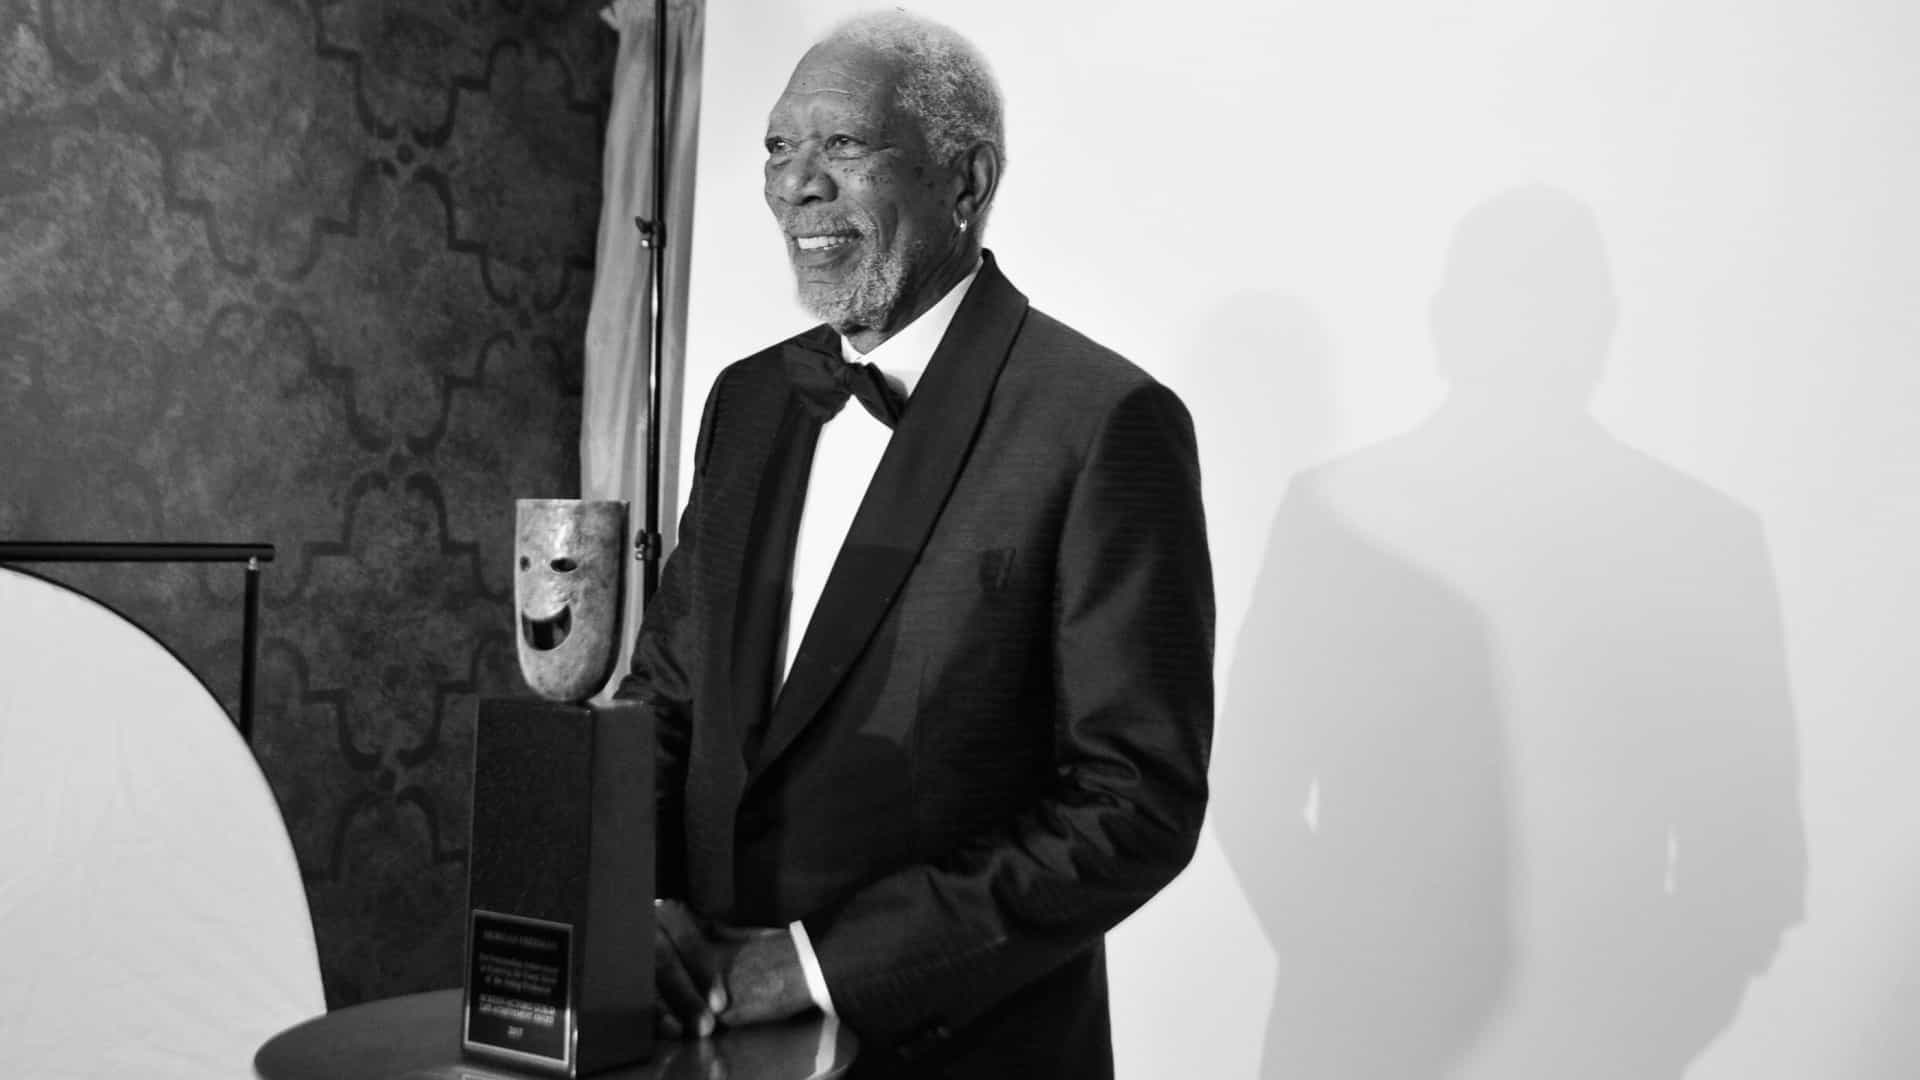 Morgan Freeman poderá perder prêmio após acusações de assédio sexual